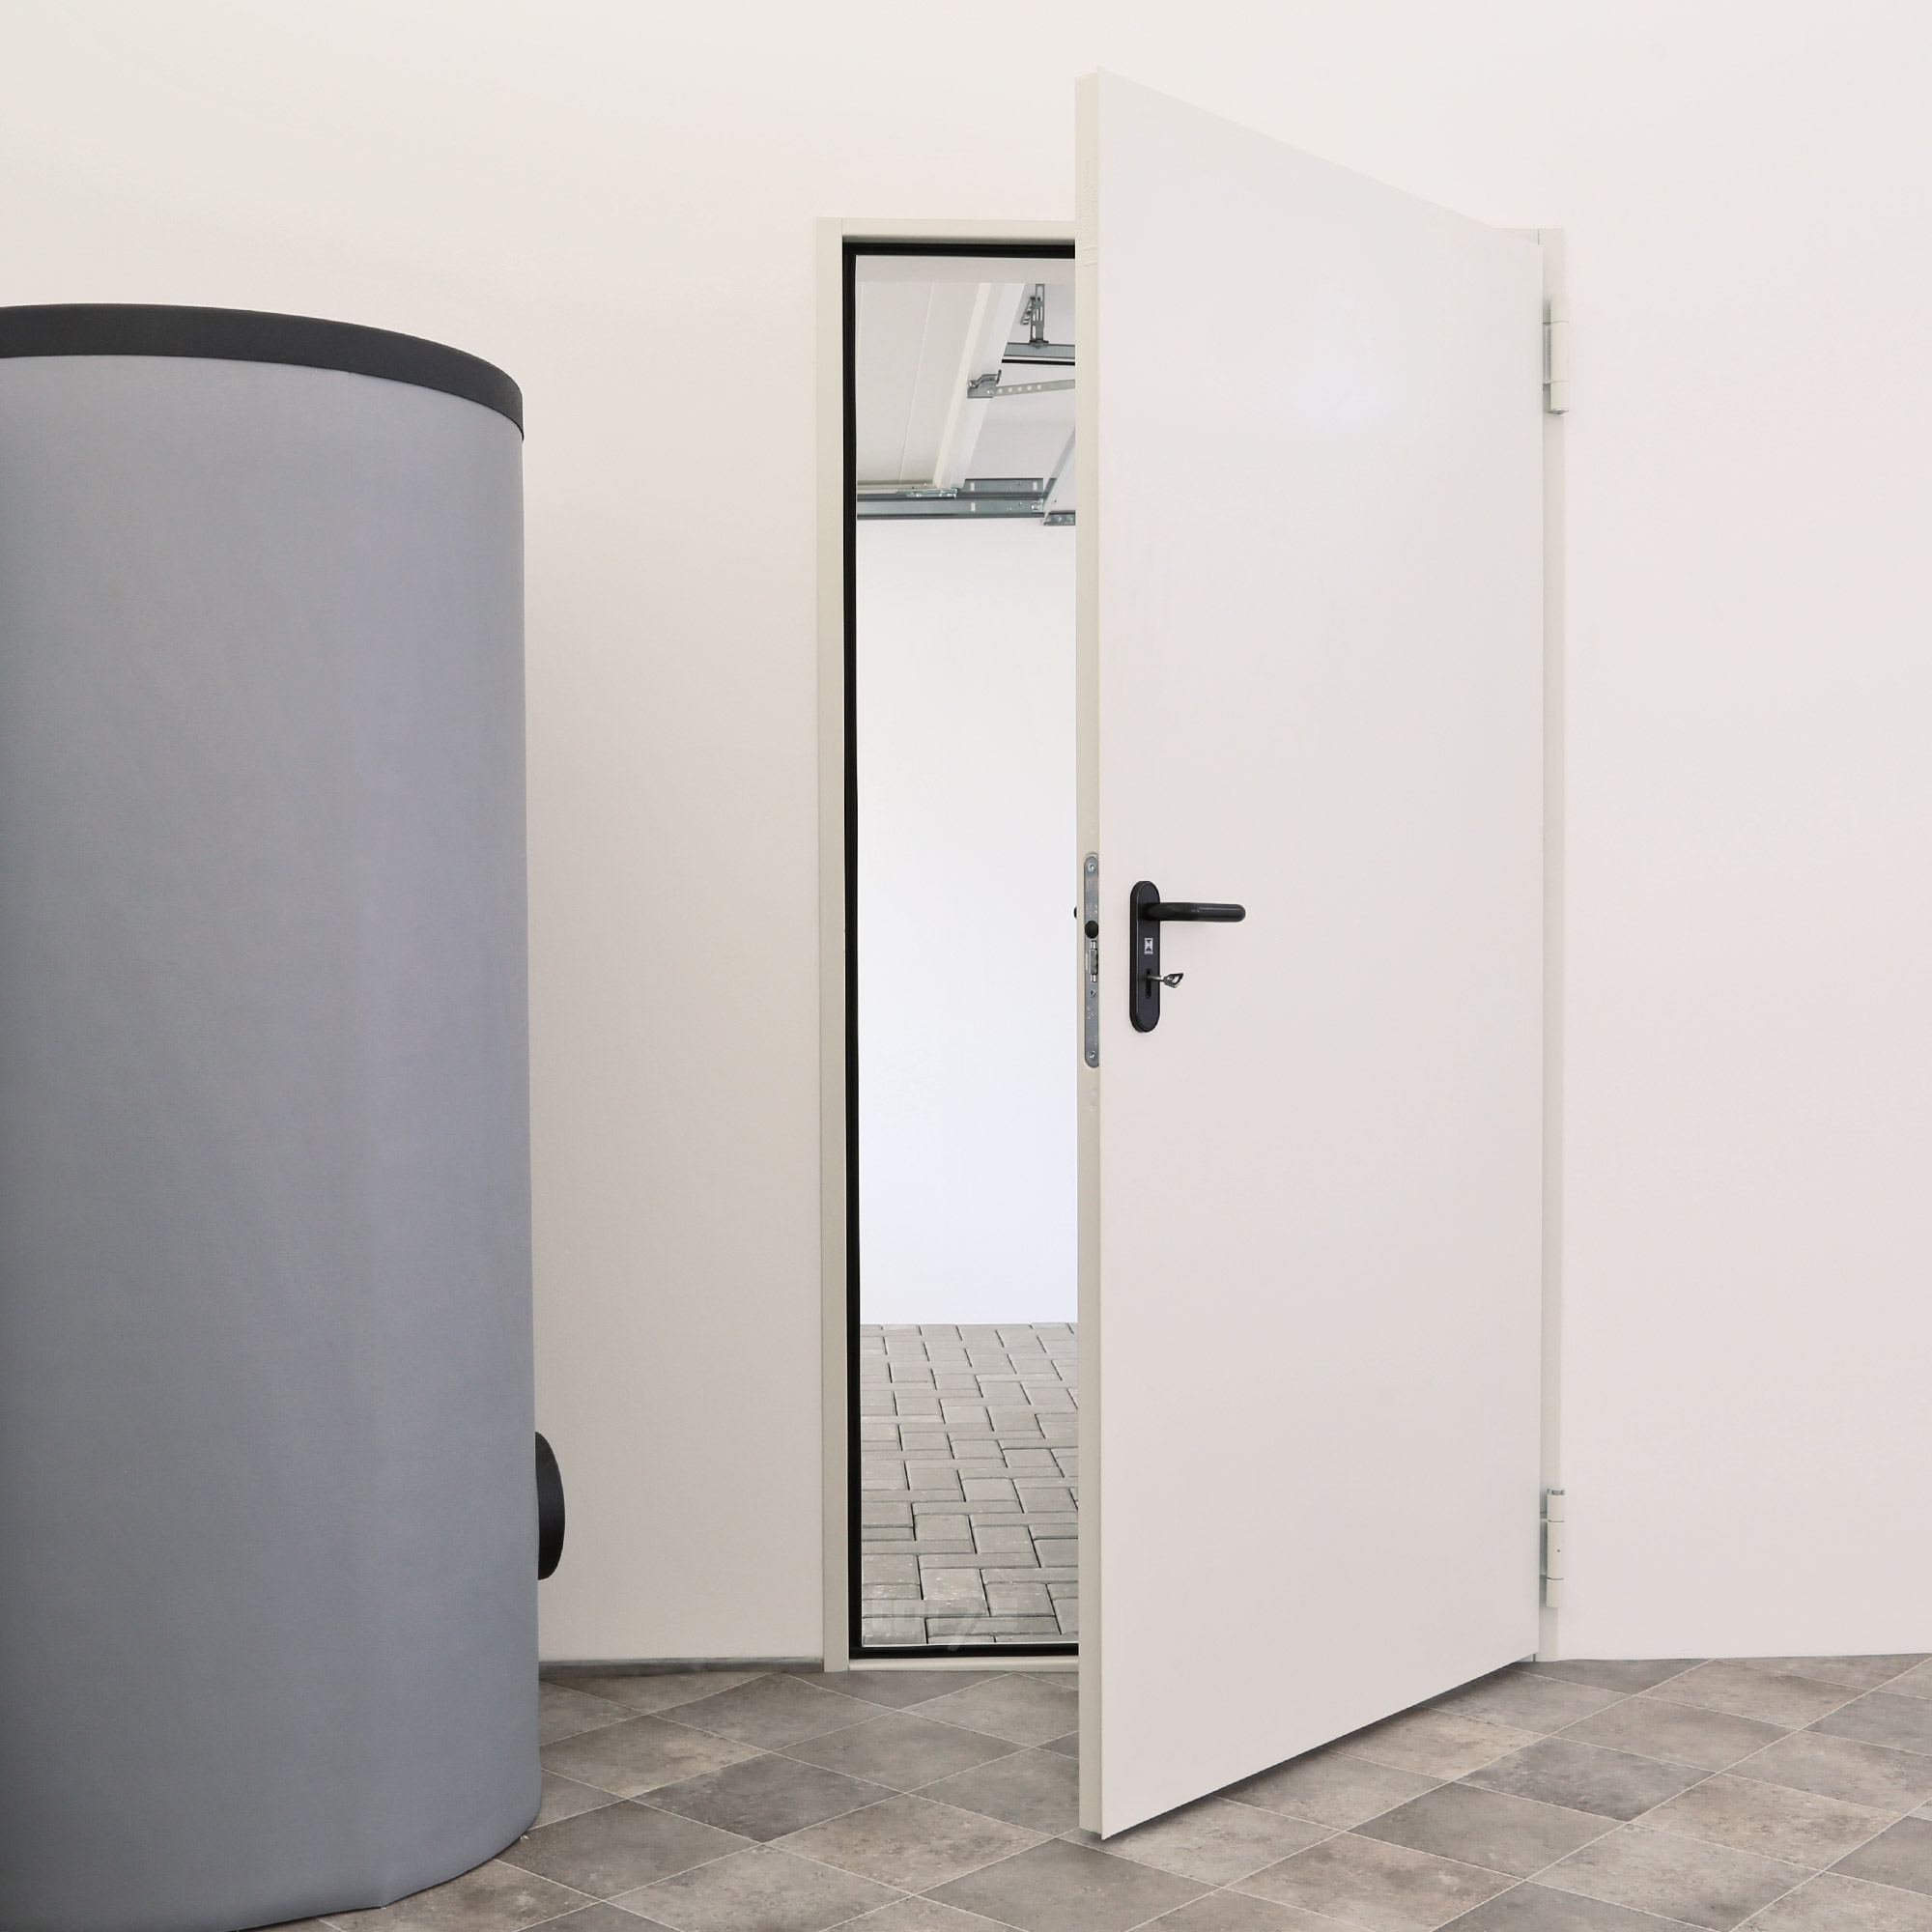 h rmann feuerschutzt r t 30 brandschutzt r. Black Bedroom Furniture Sets. Home Design Ideas